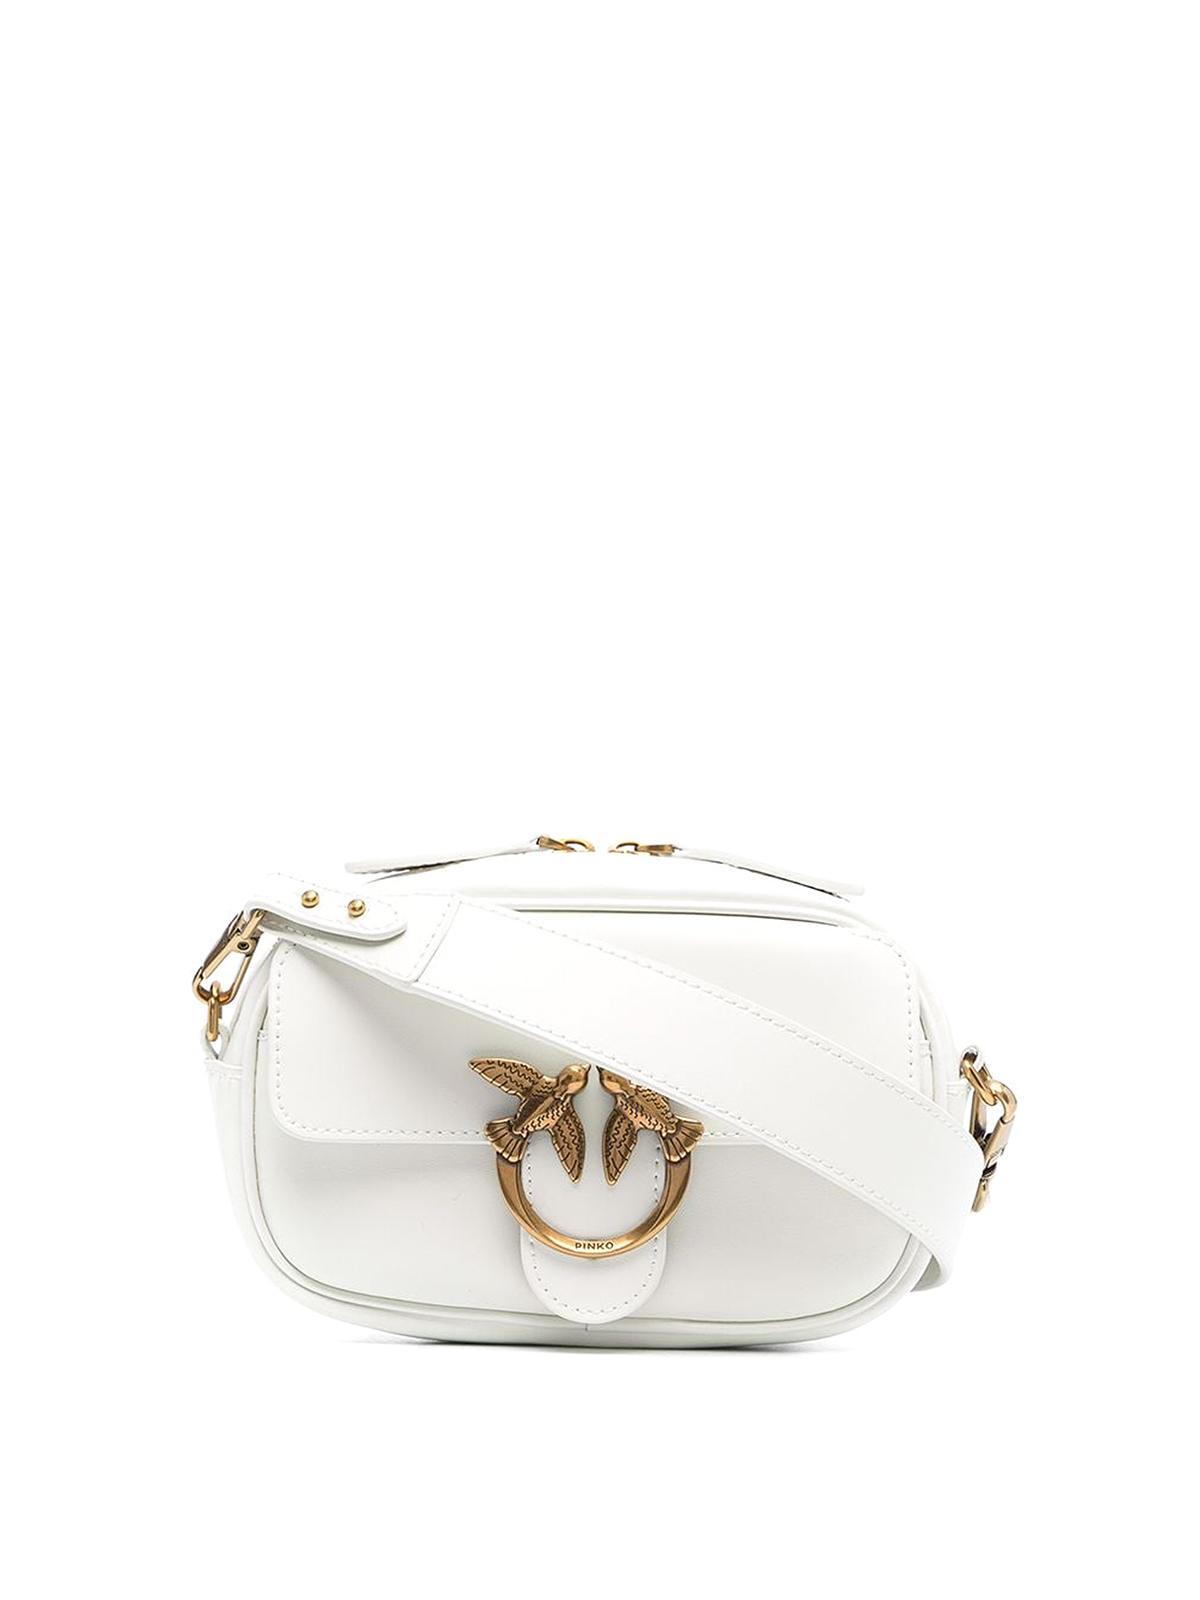 Pinko Crossbody bags LOVE SMART BAG SIMPLY CROSSBODY